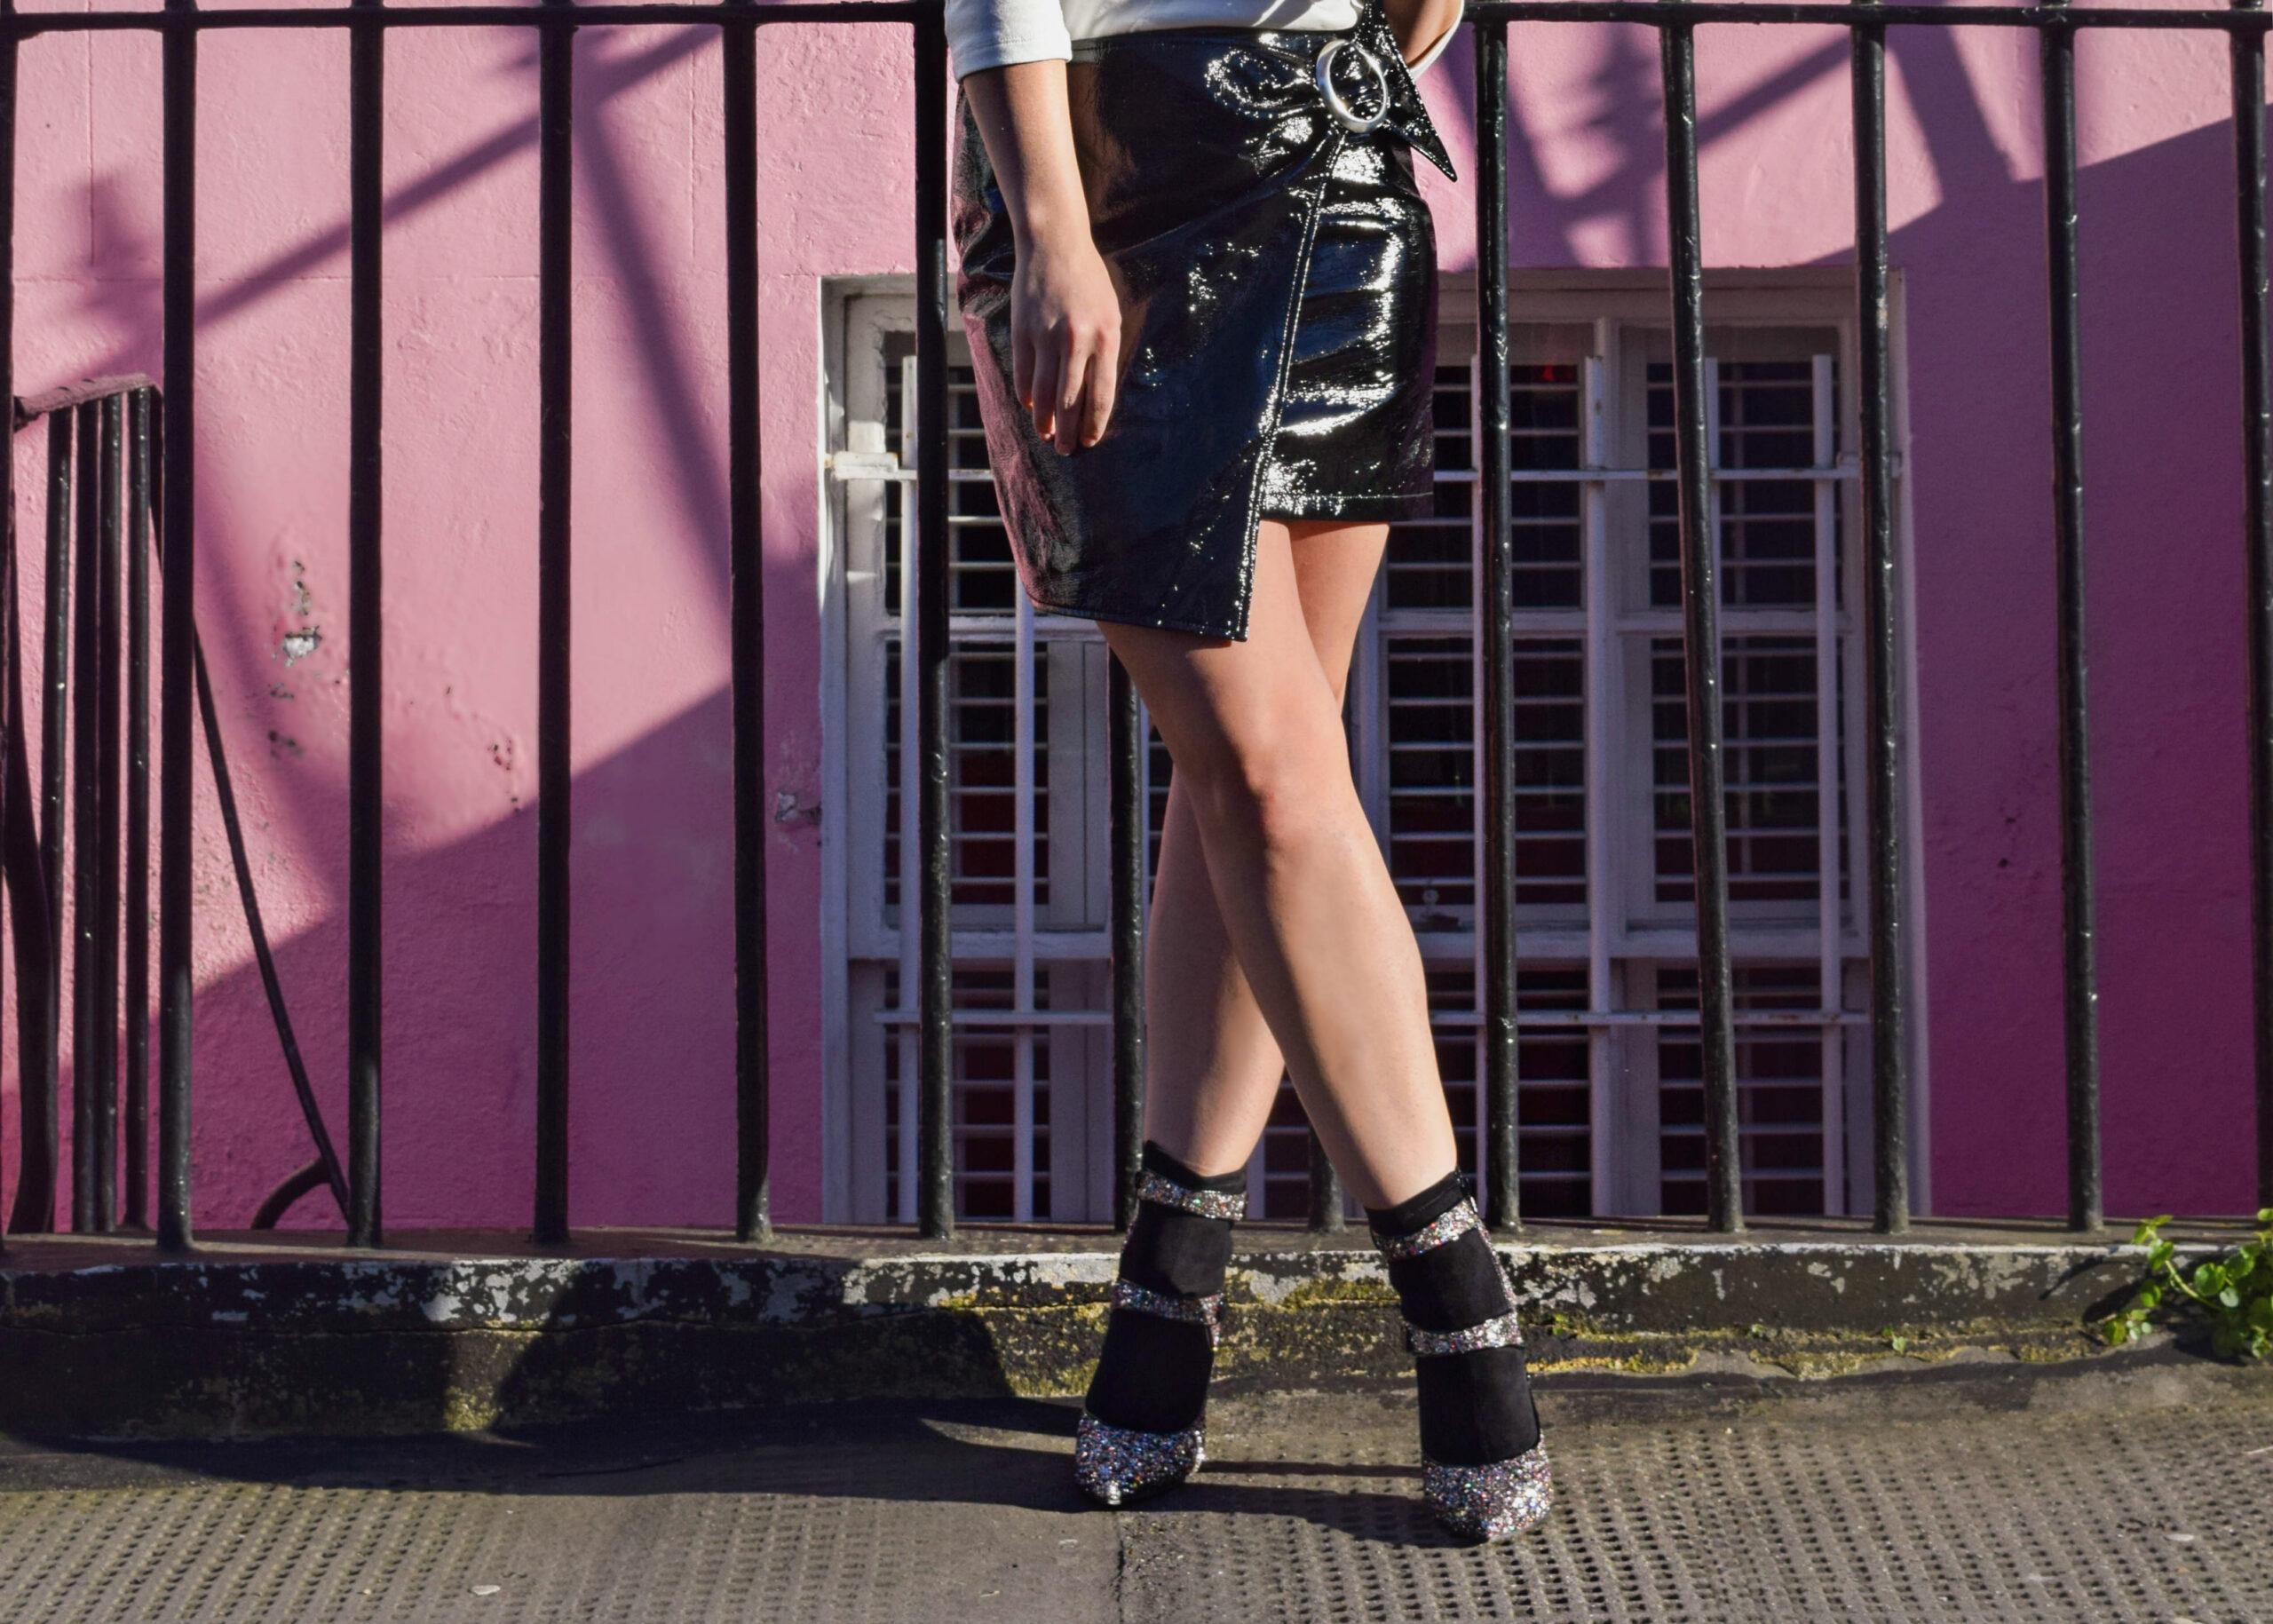 Pink Walls- Notting Hill- BloggerNotBillionaire.com